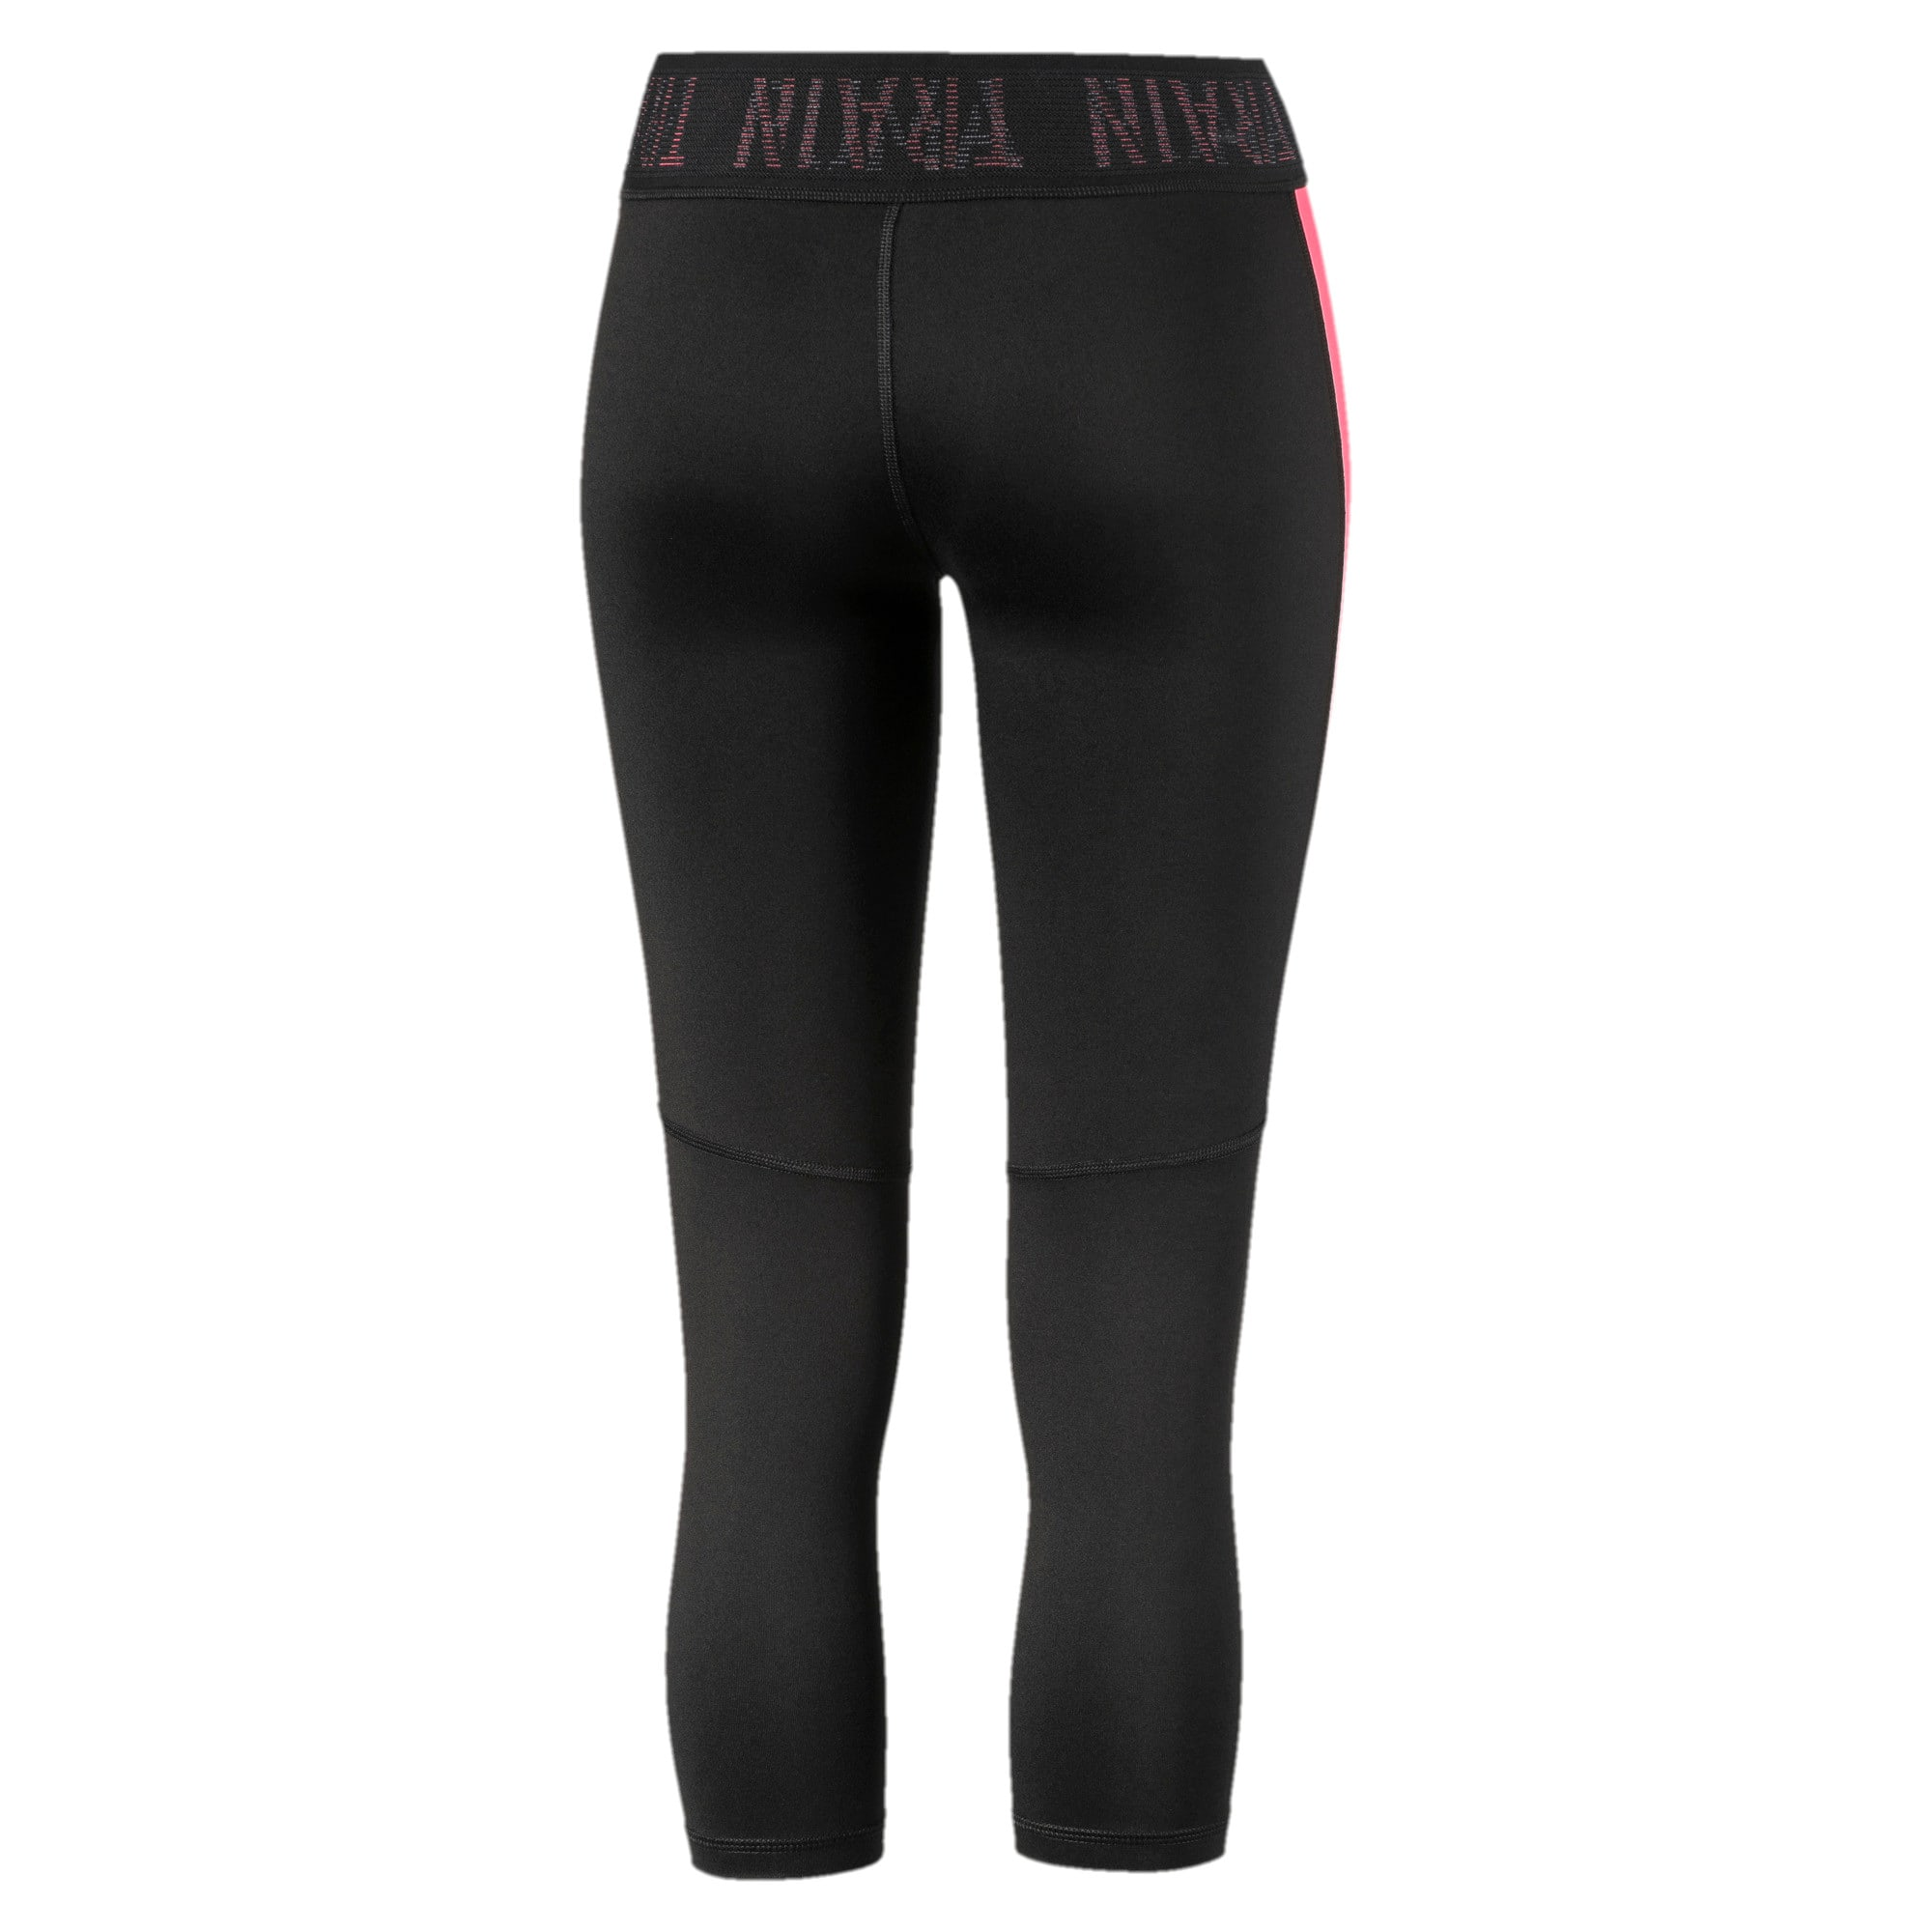 Thumbnail 5 of Logo Women's 3/4 Leggings, Puma Black-Pink Alert, medium